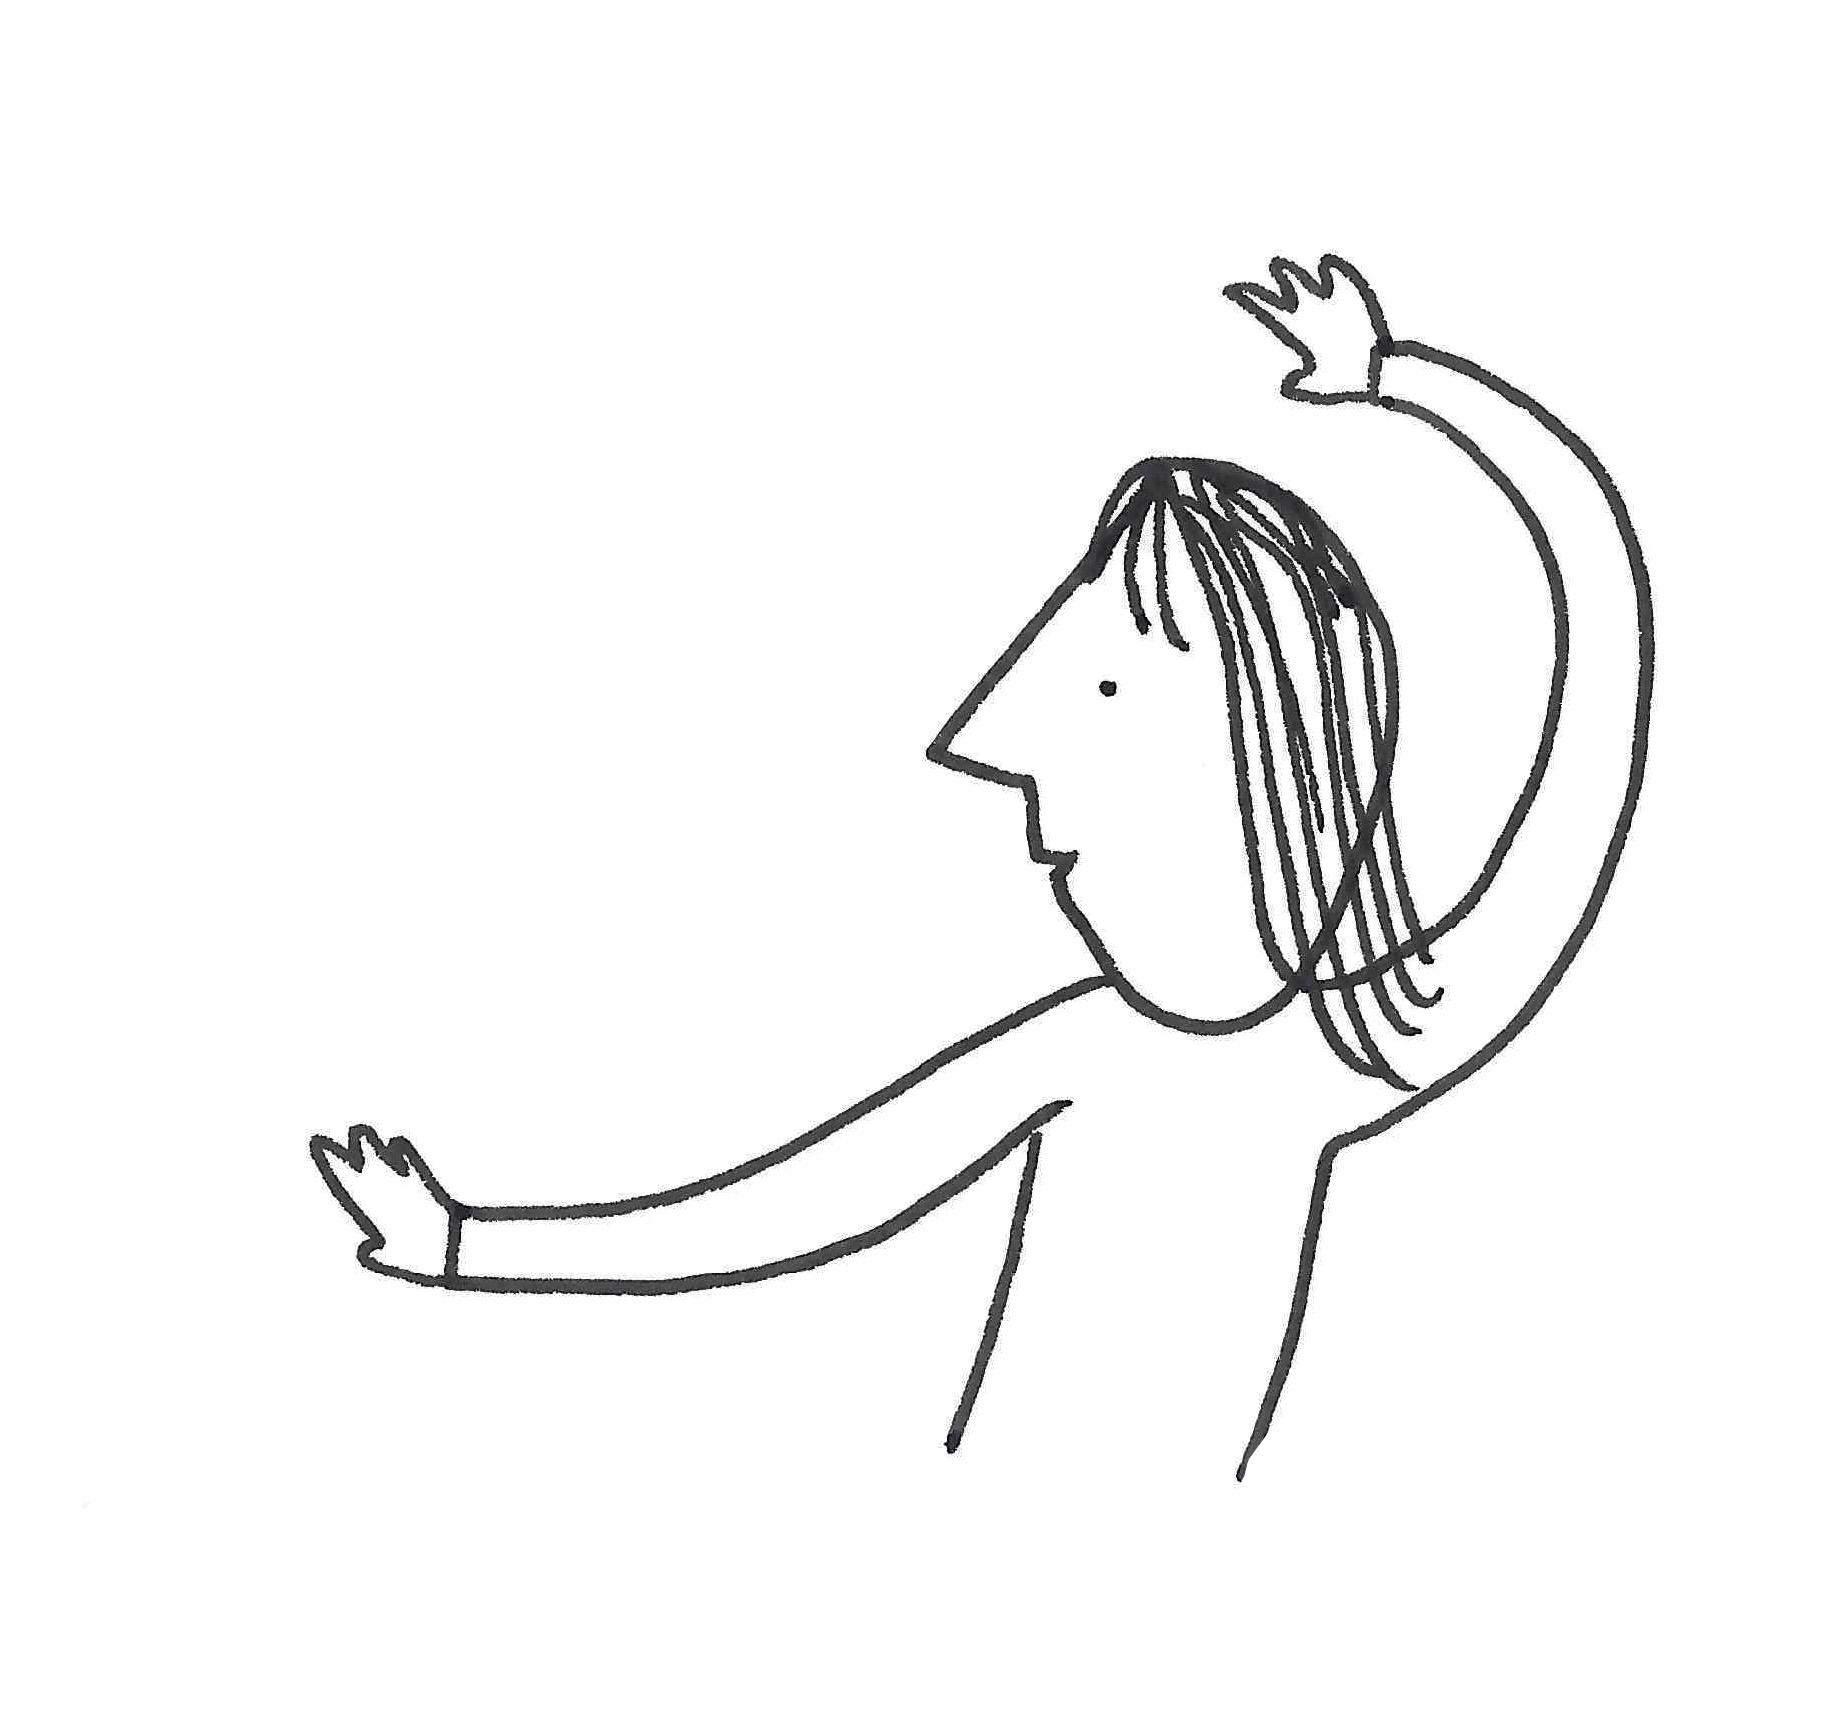 Flourishing hand gestures